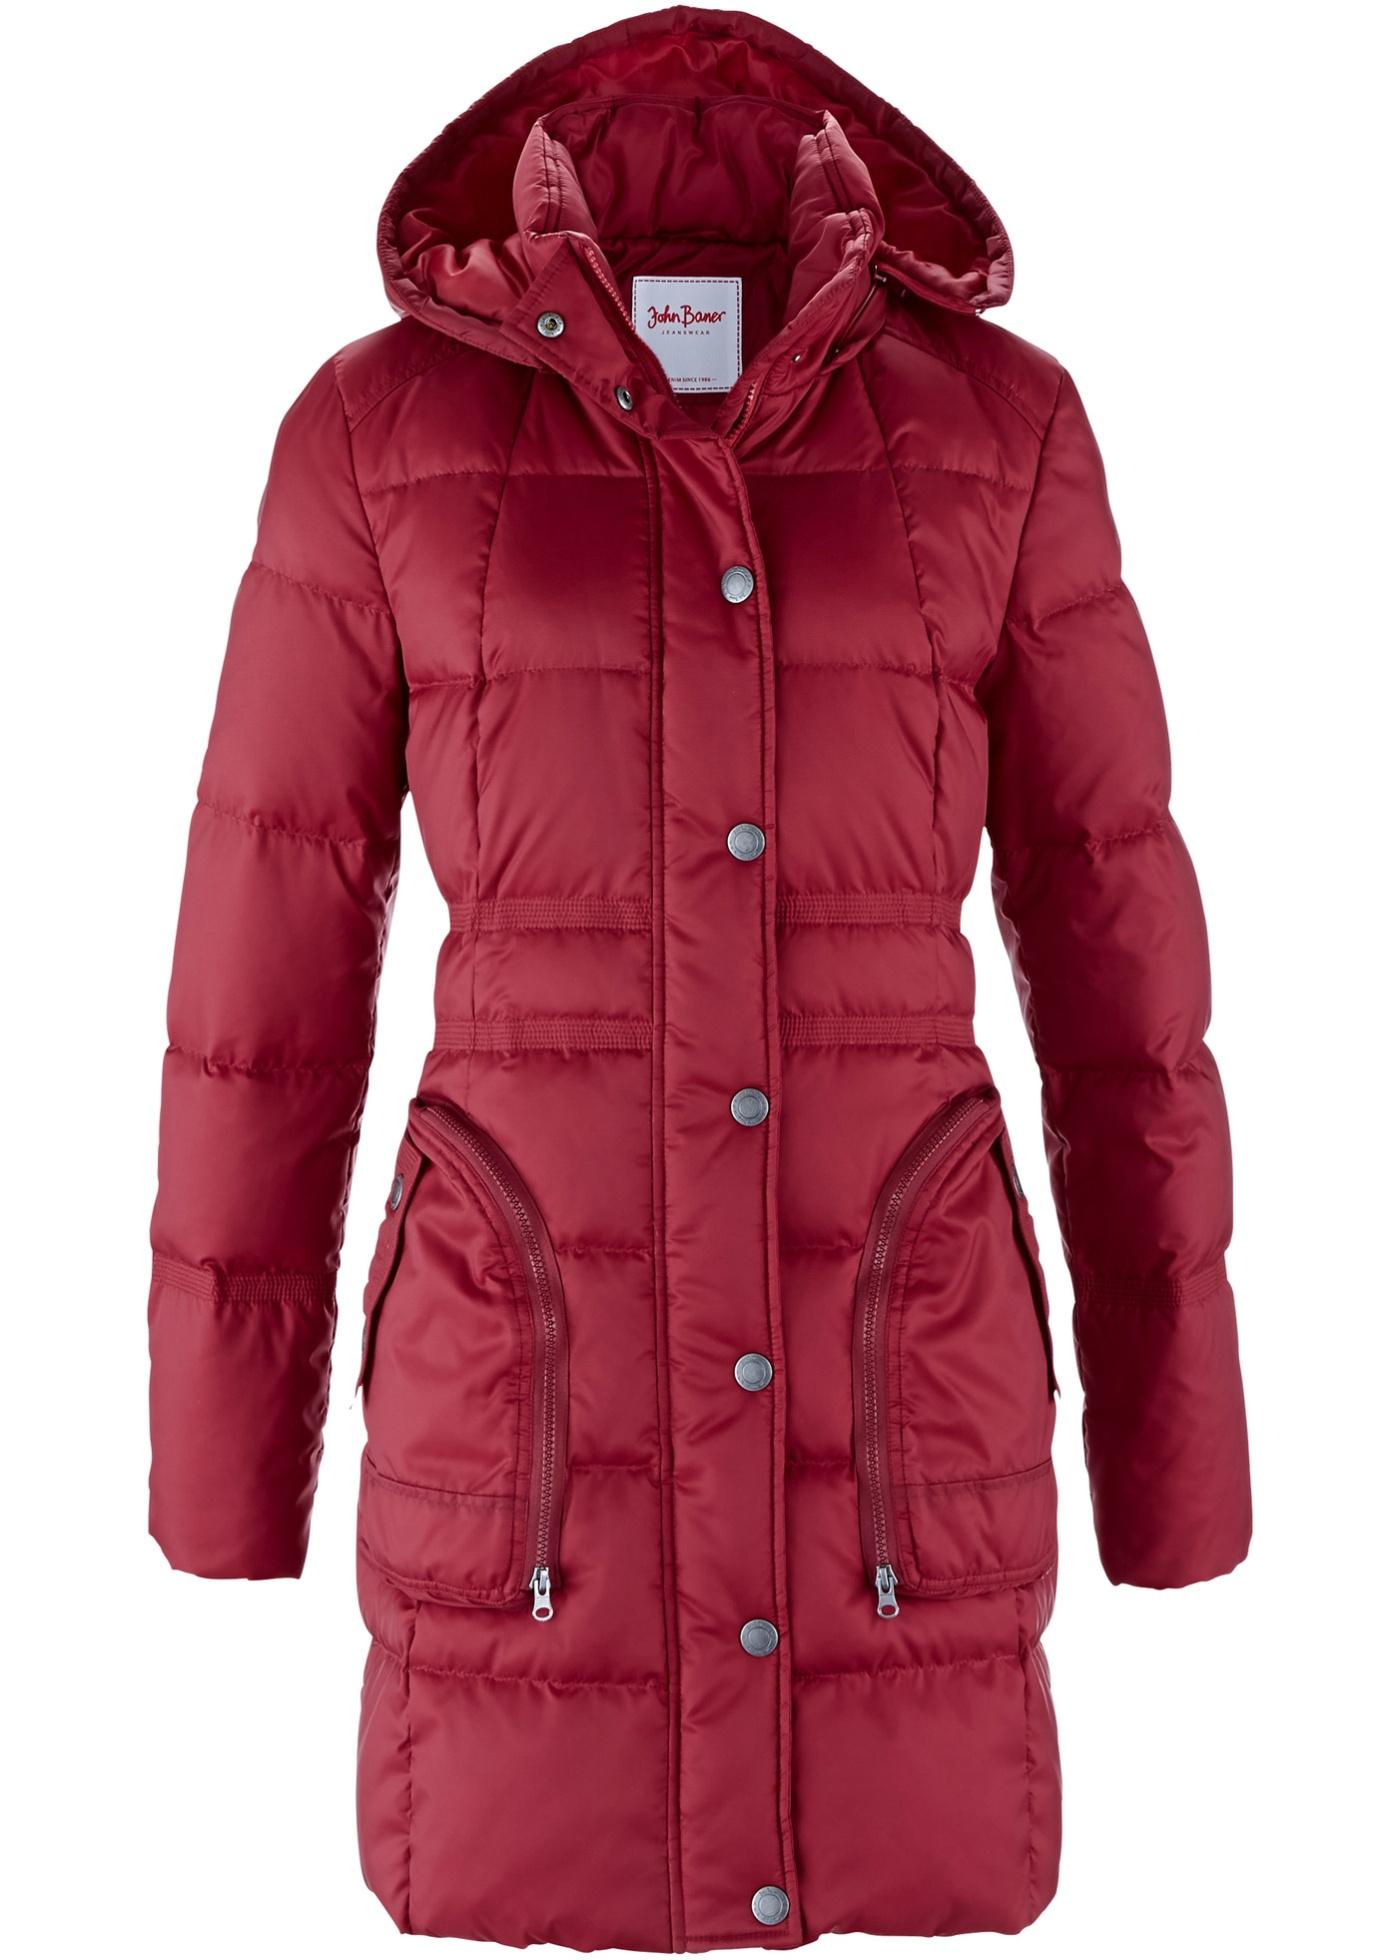 John Baner JEANSWEAR Daunenmantel langarm  in rot für Damen von bonprix Damenmode > Damenbekleidung > Damen Jacken & Mäntel > Mäntel